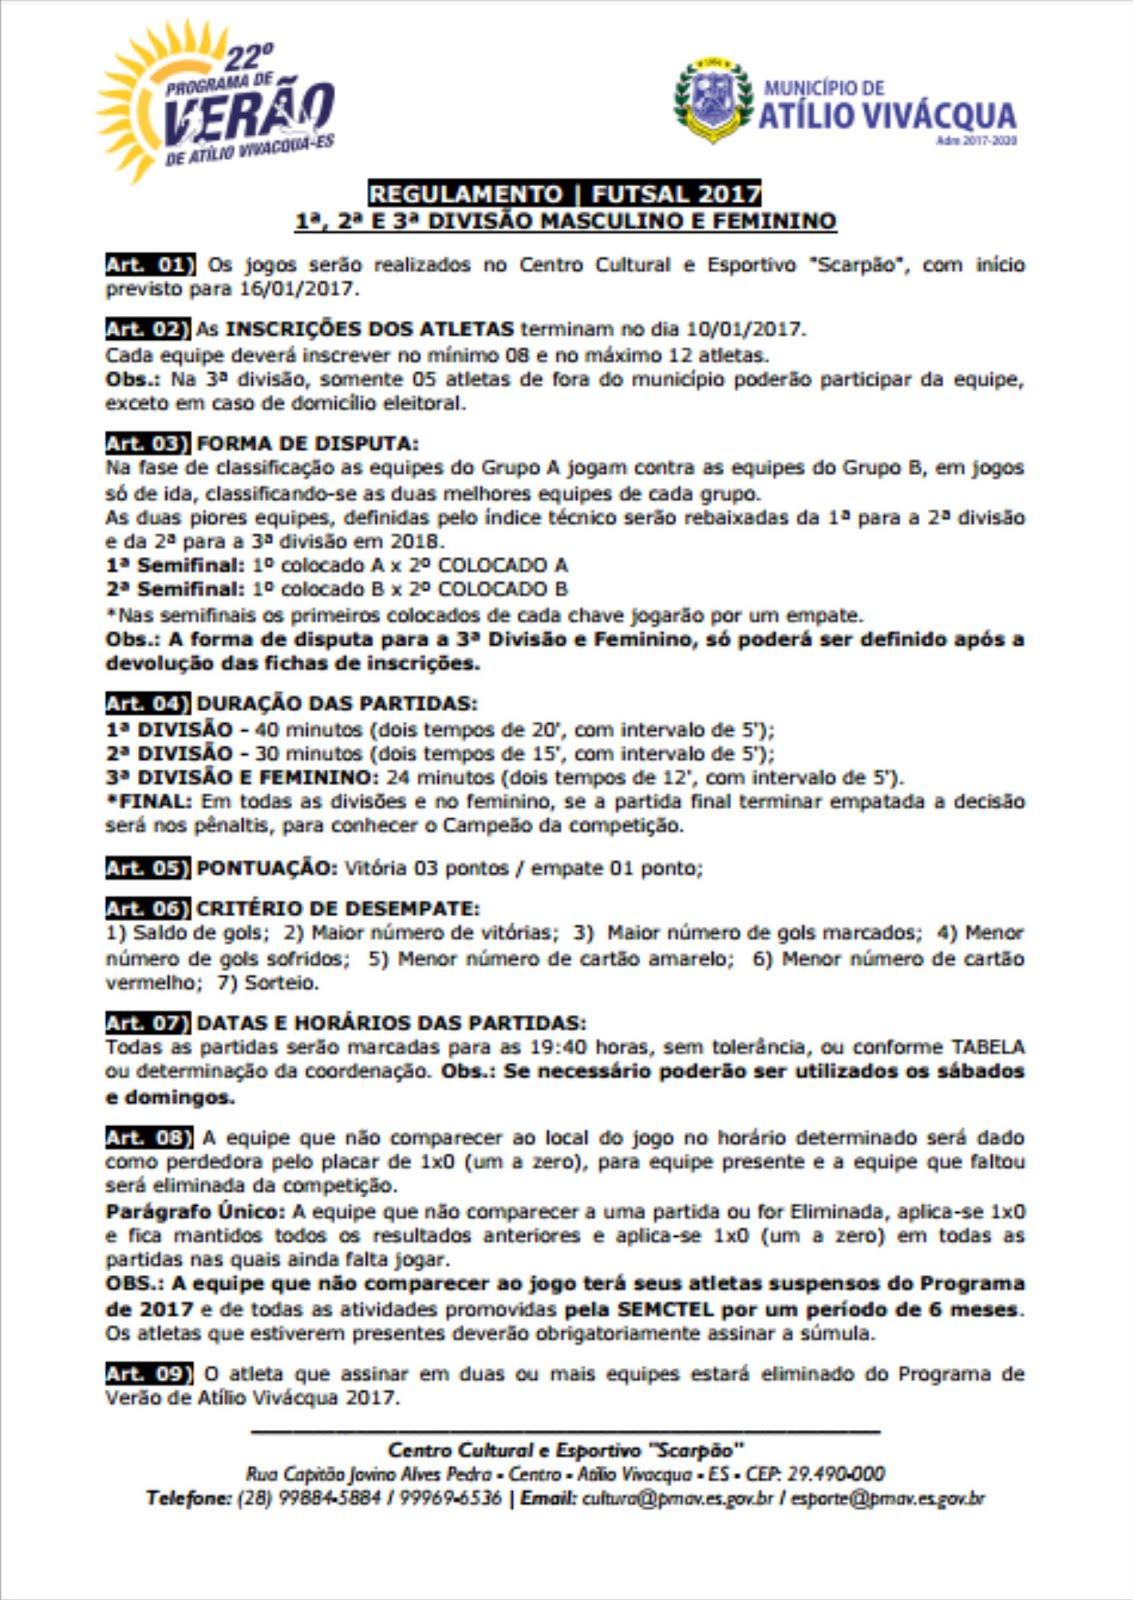 FUTSAL 2017 - Regulamento